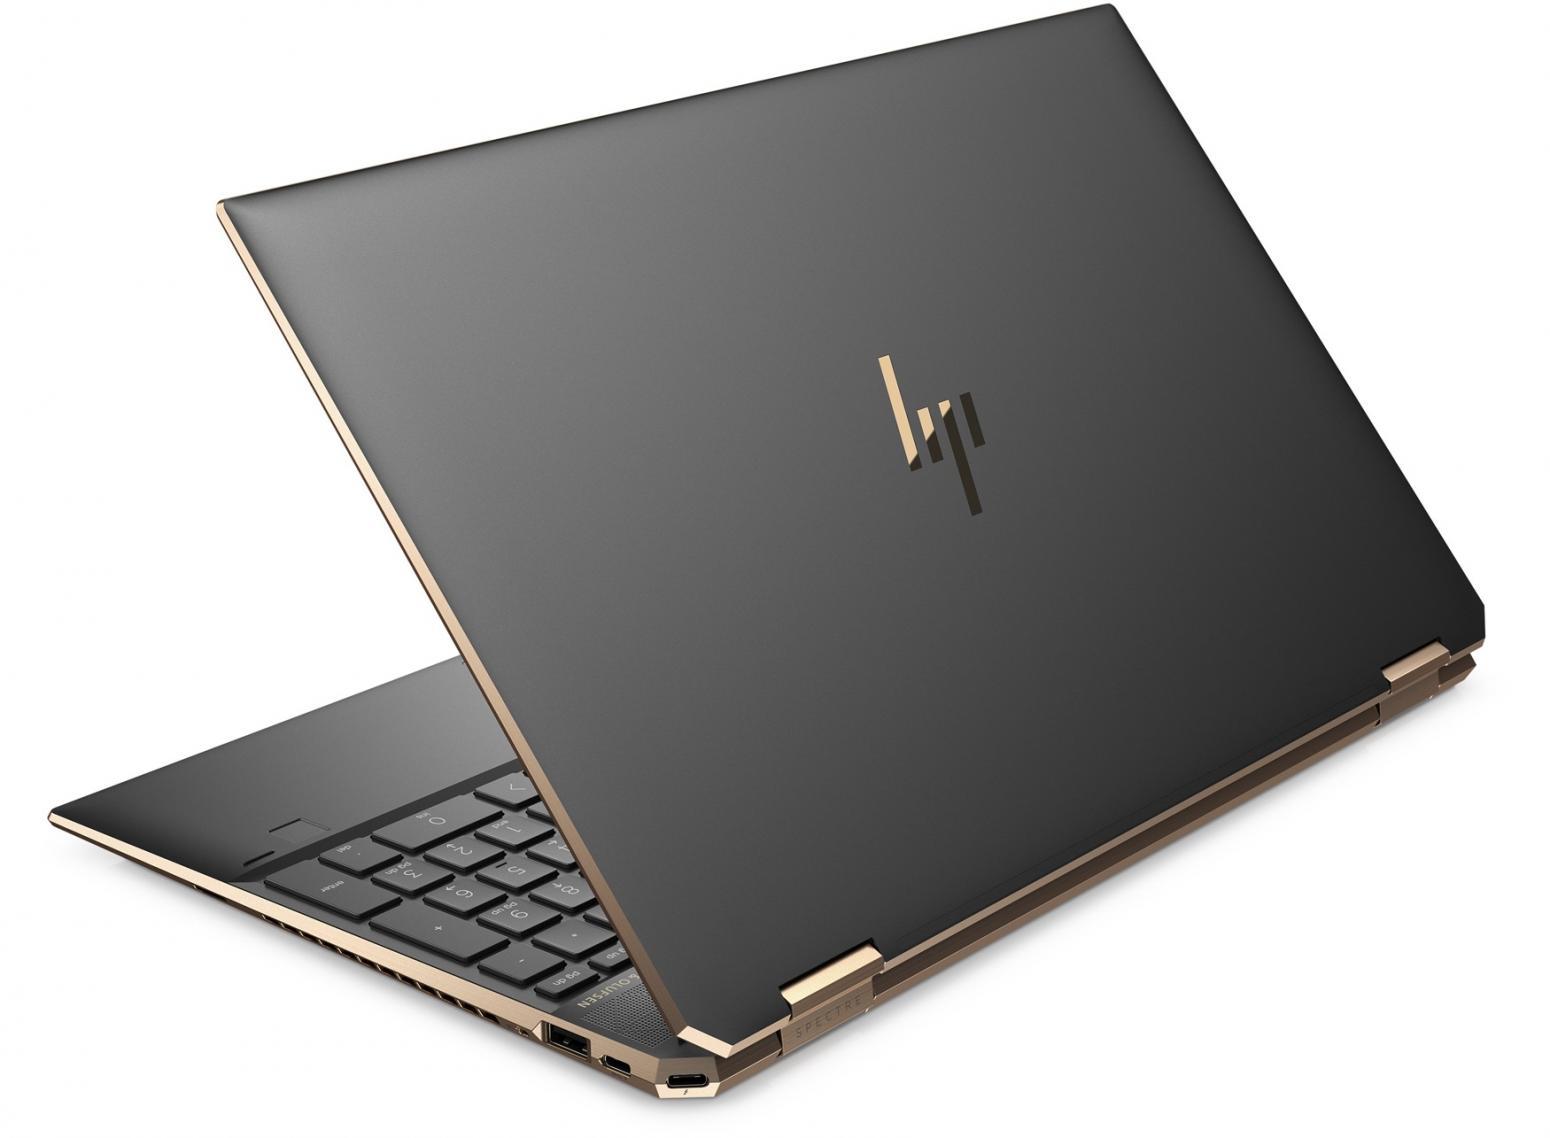 Ordinateur portable HP Spectre x360 15-eb0013nf Noir - Tactile 4K OLED, GTX 1650 Ti Max-Q - photo 7